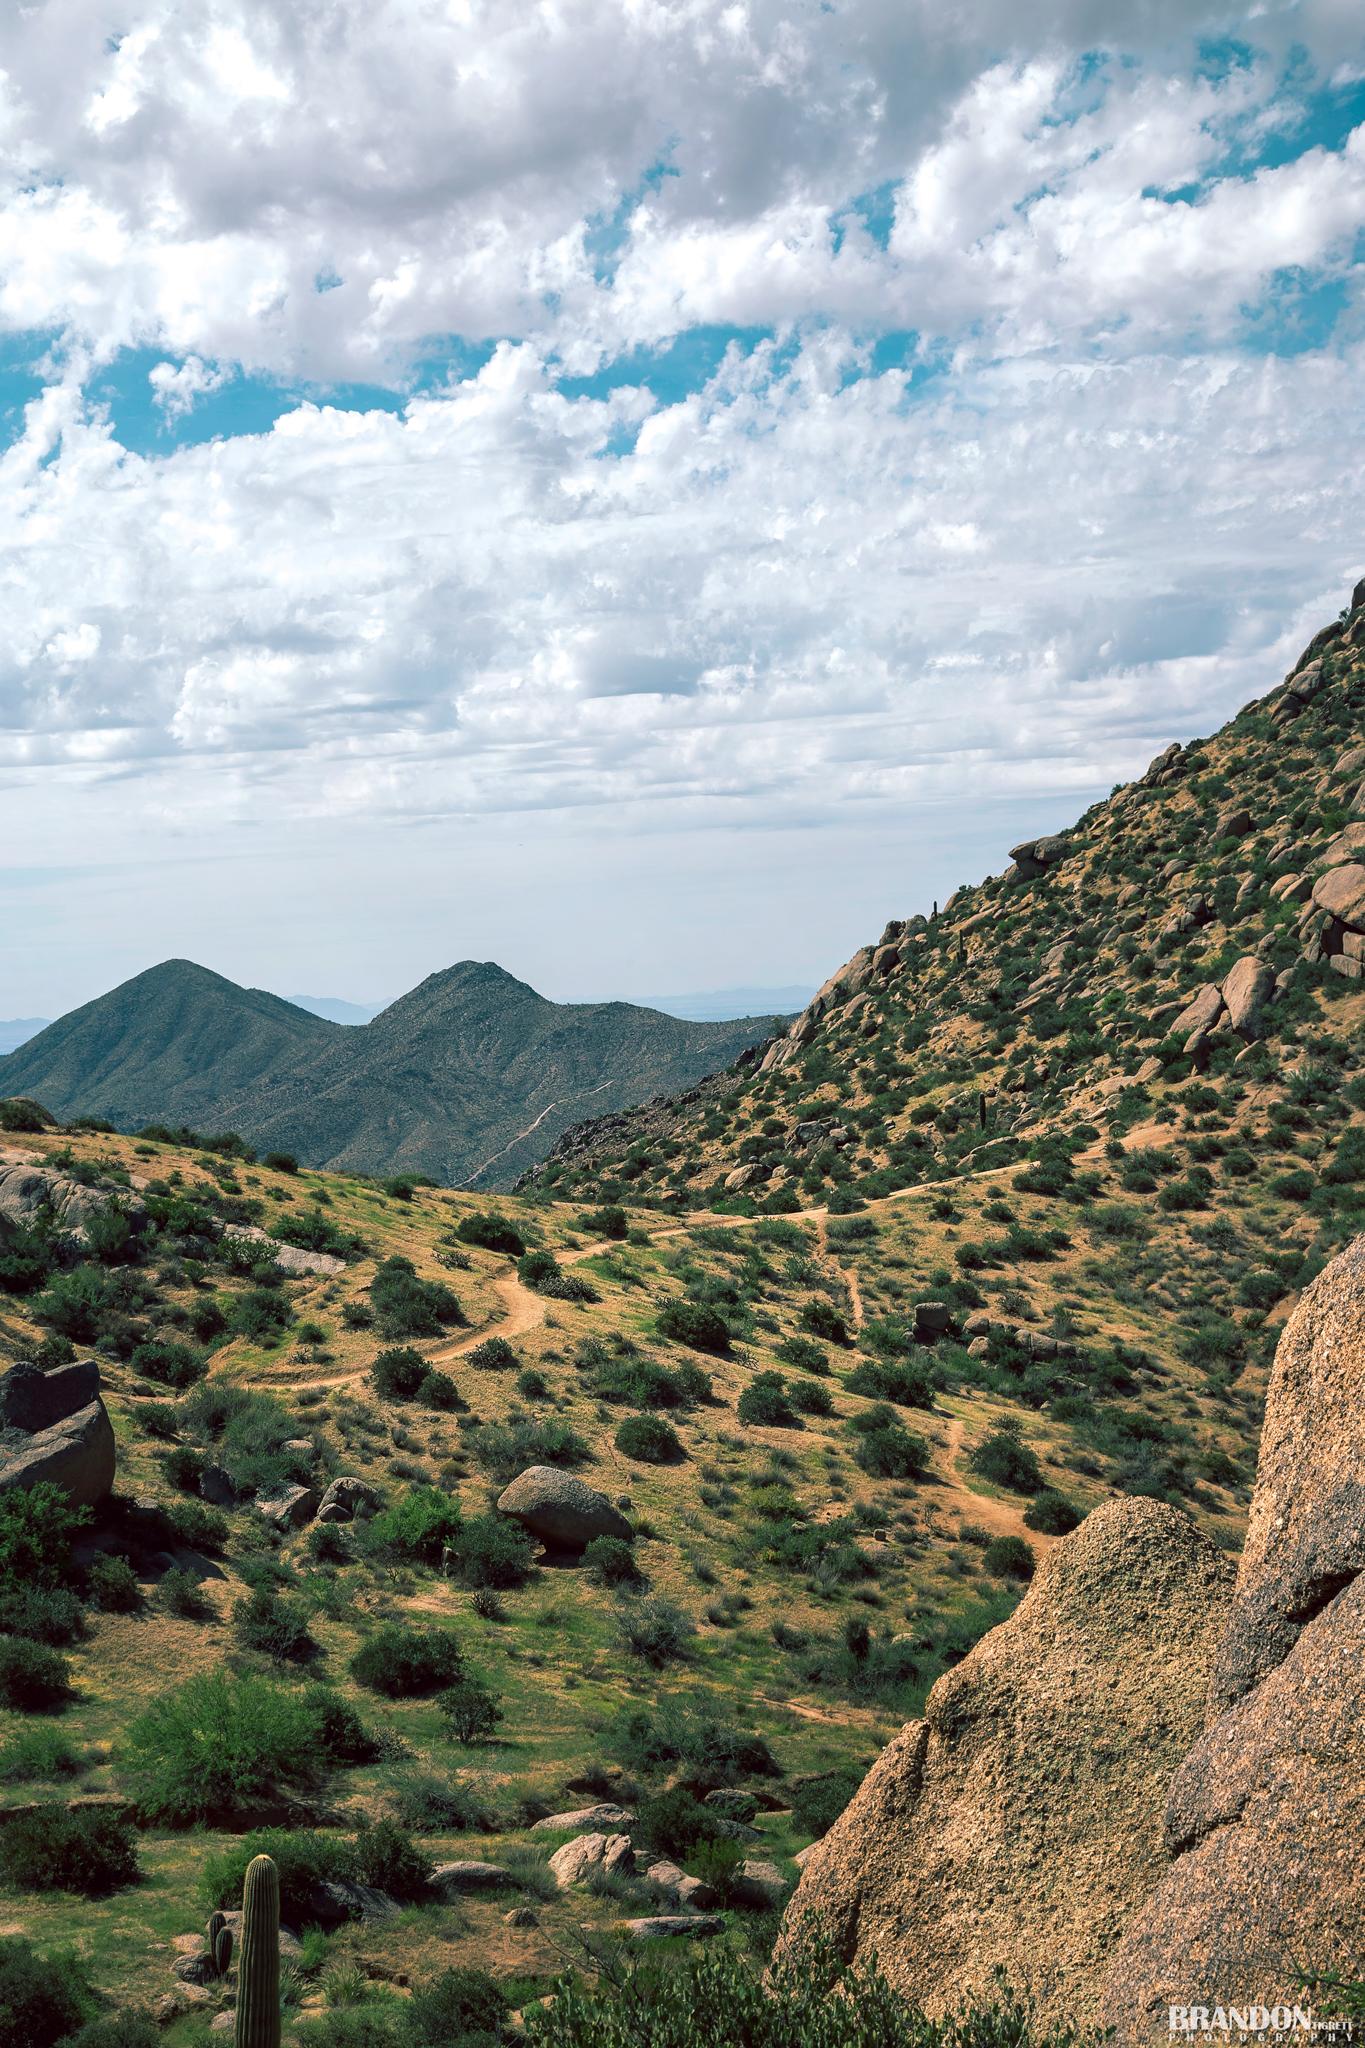 Green Mountains of Arizona - Tom's Thumb Trail